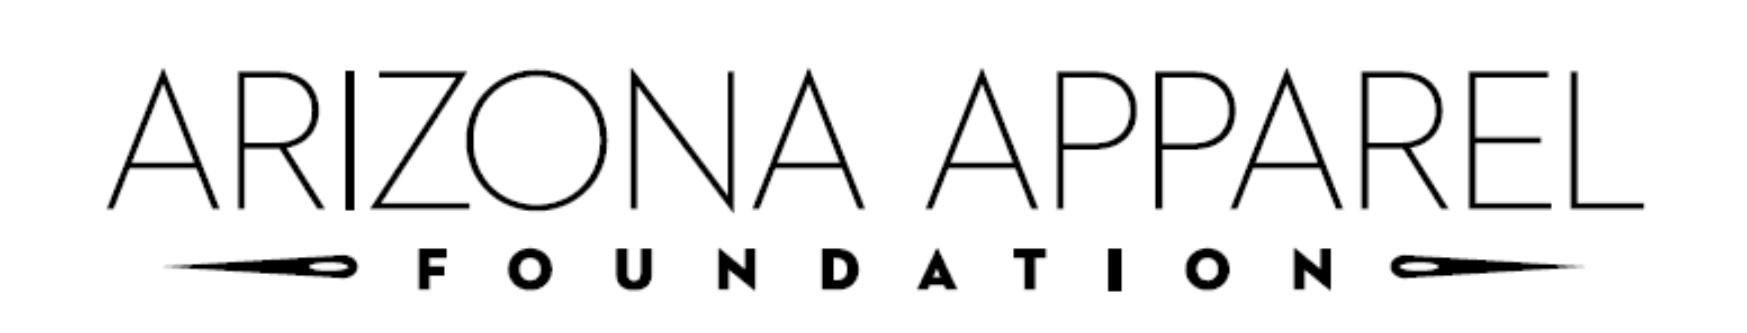 www.azapparelfoundation.org